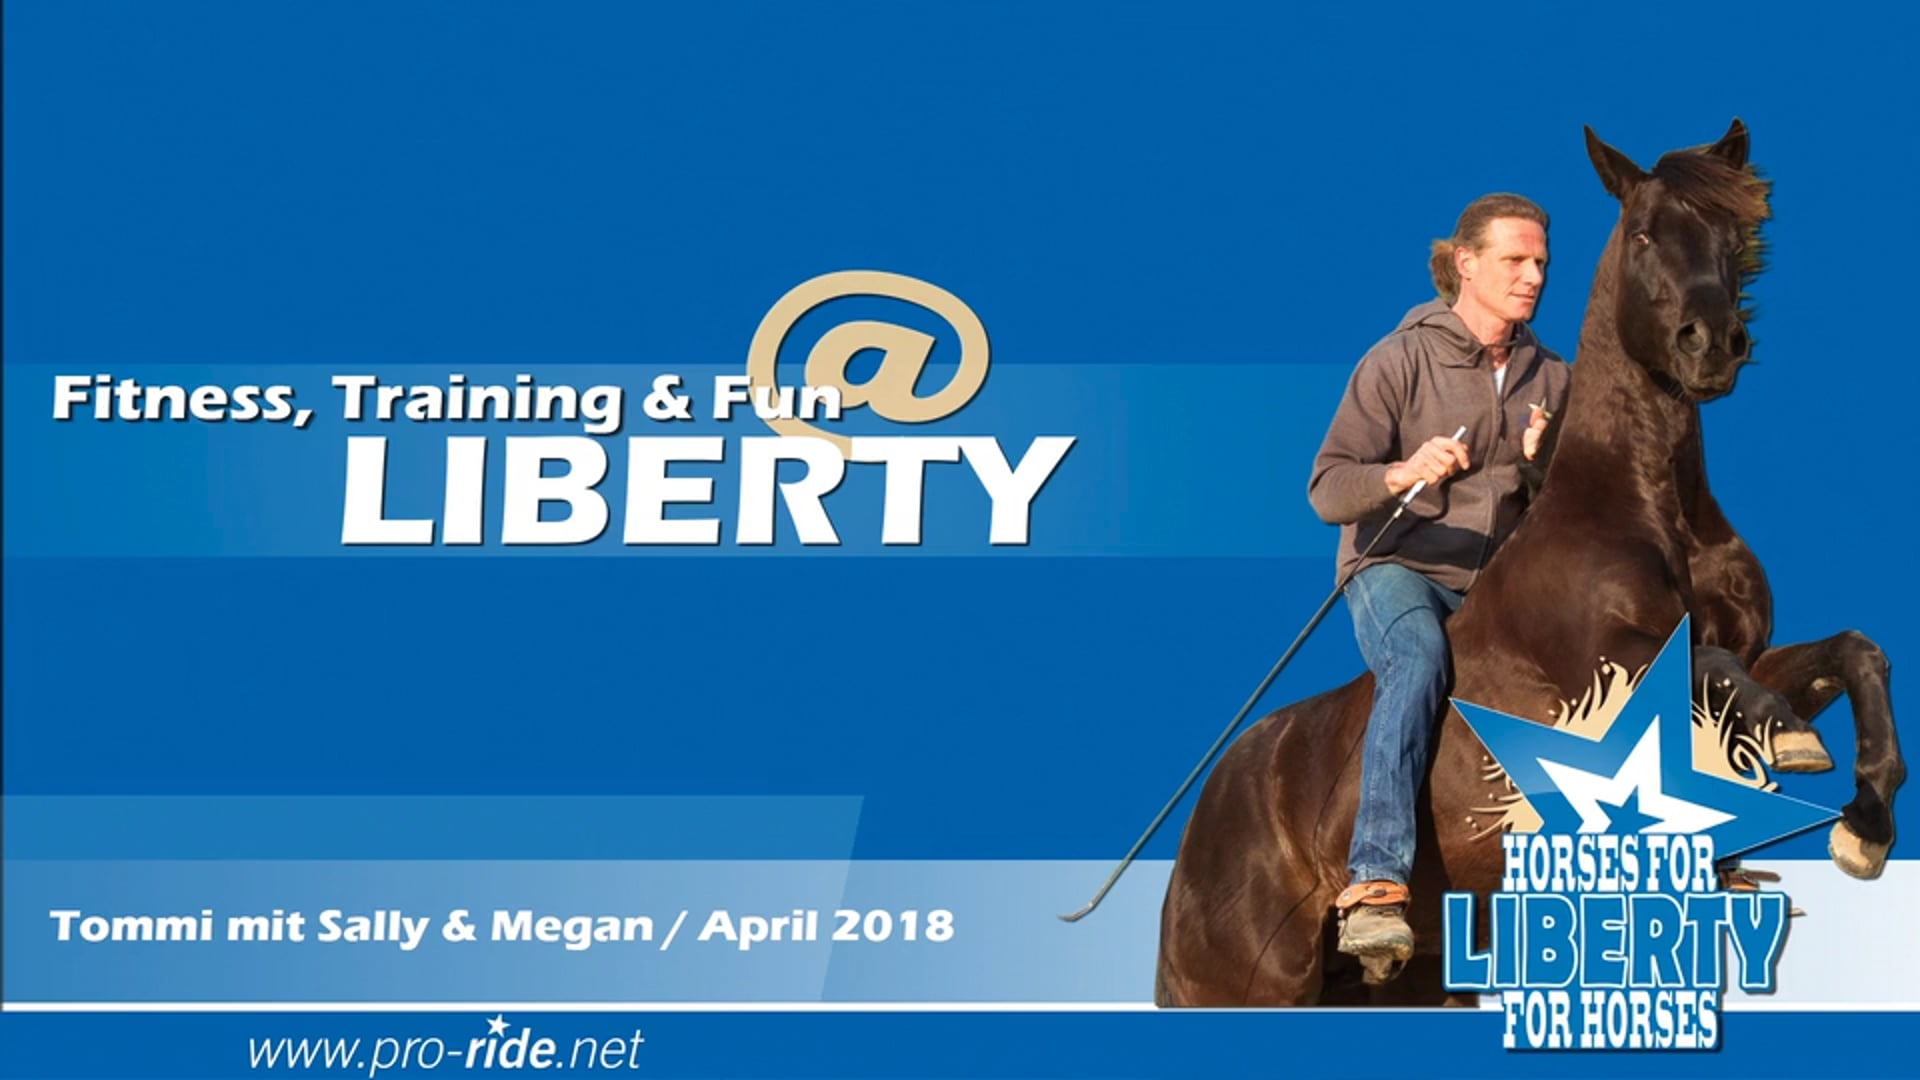 Fitness, Training & Fun @ Liberty